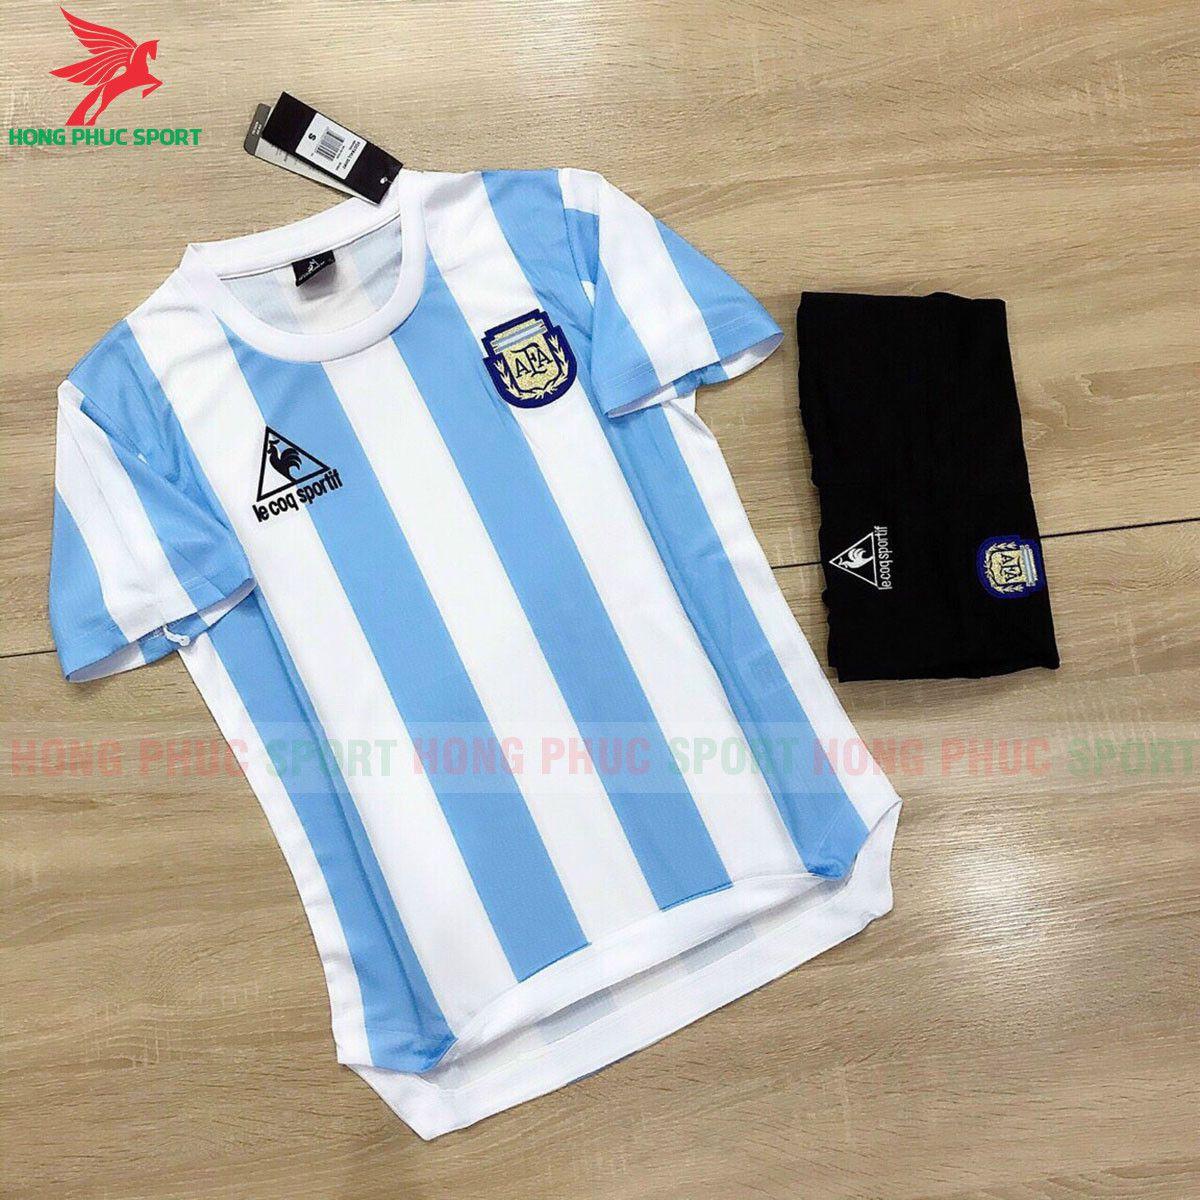 https://cdn.hongphucsport.com/unsafe/s4.shopbay.vn/files/285/ao-bong-da-argentina-1986-world-cup-60f2644fa1b3a.jpg